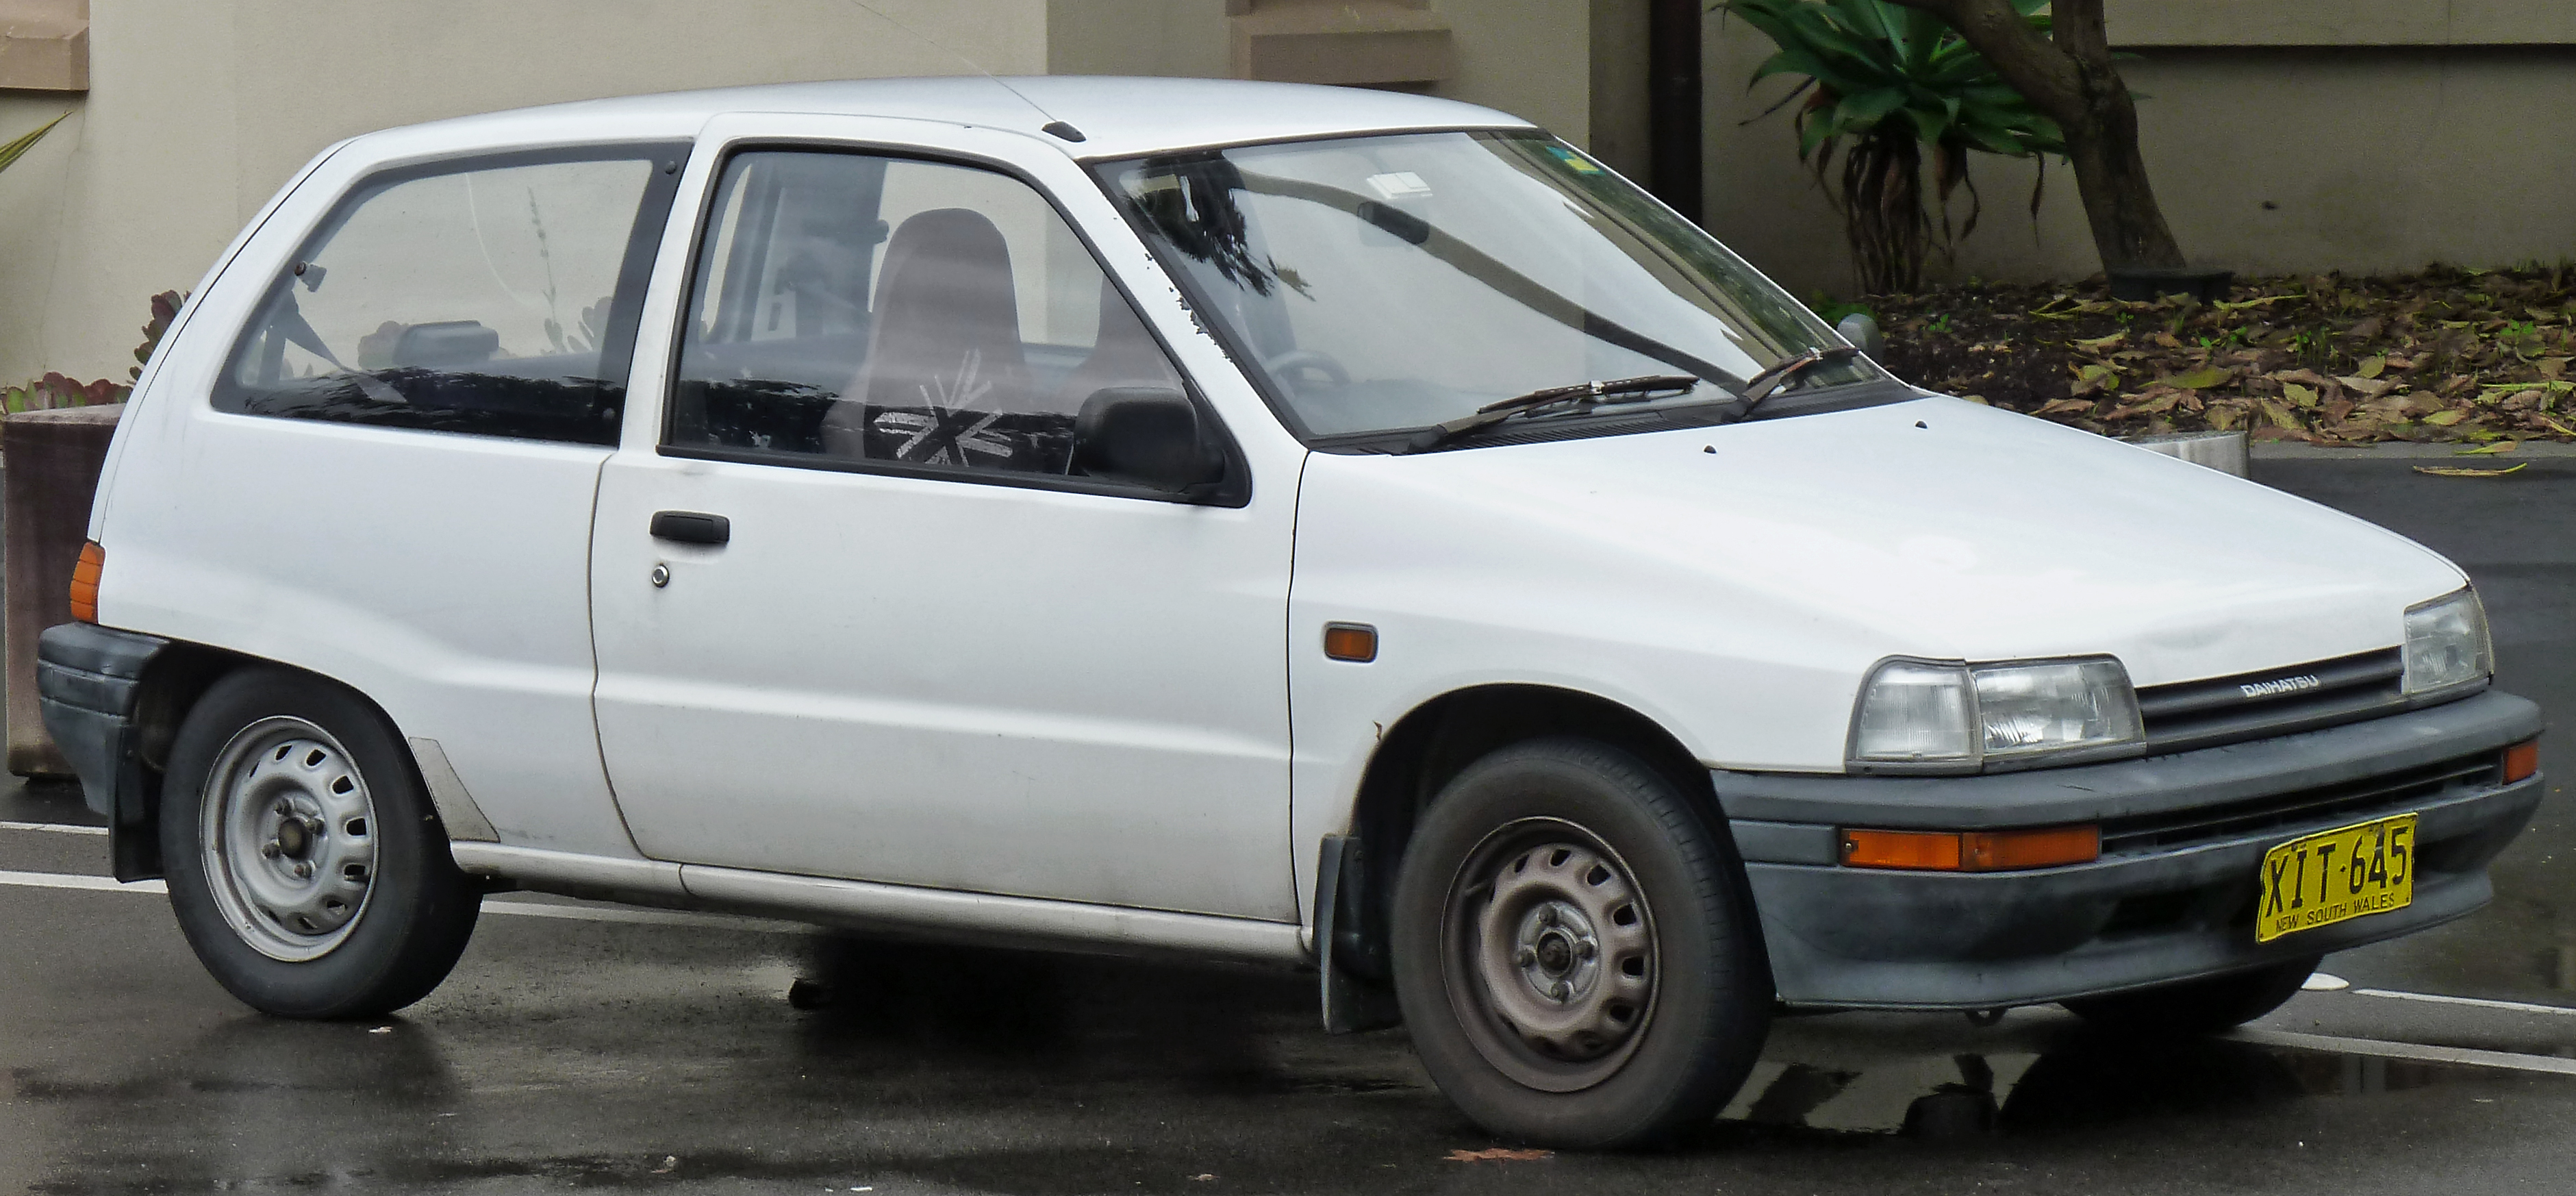 Daihatsu Charade IV Restyling 1996 - 2000 Hatchback 5 door #1